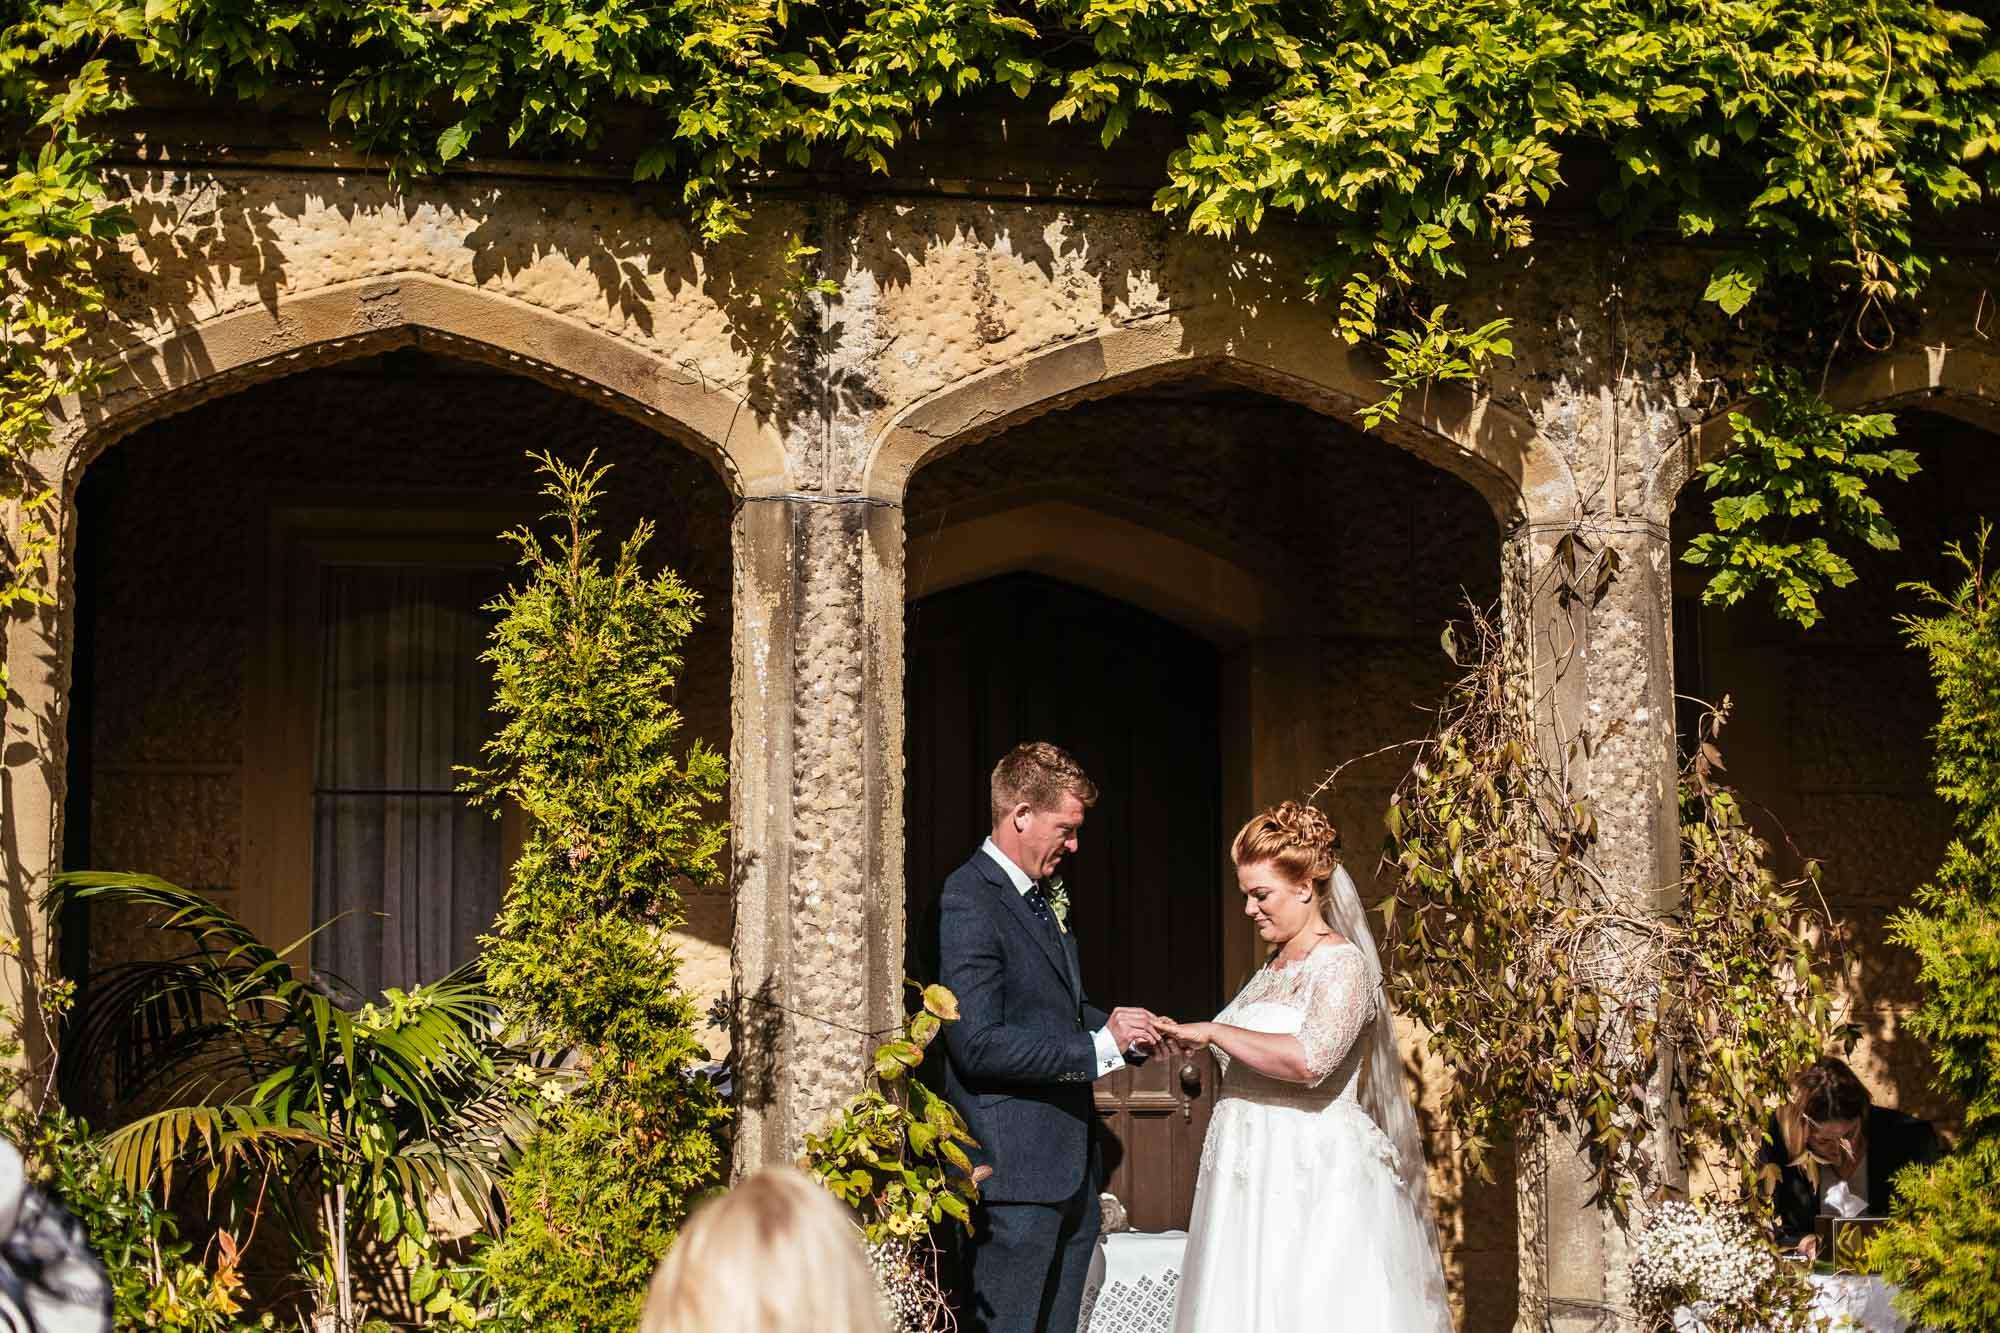 Cressbrook Hall Wedding Ceremony Photography